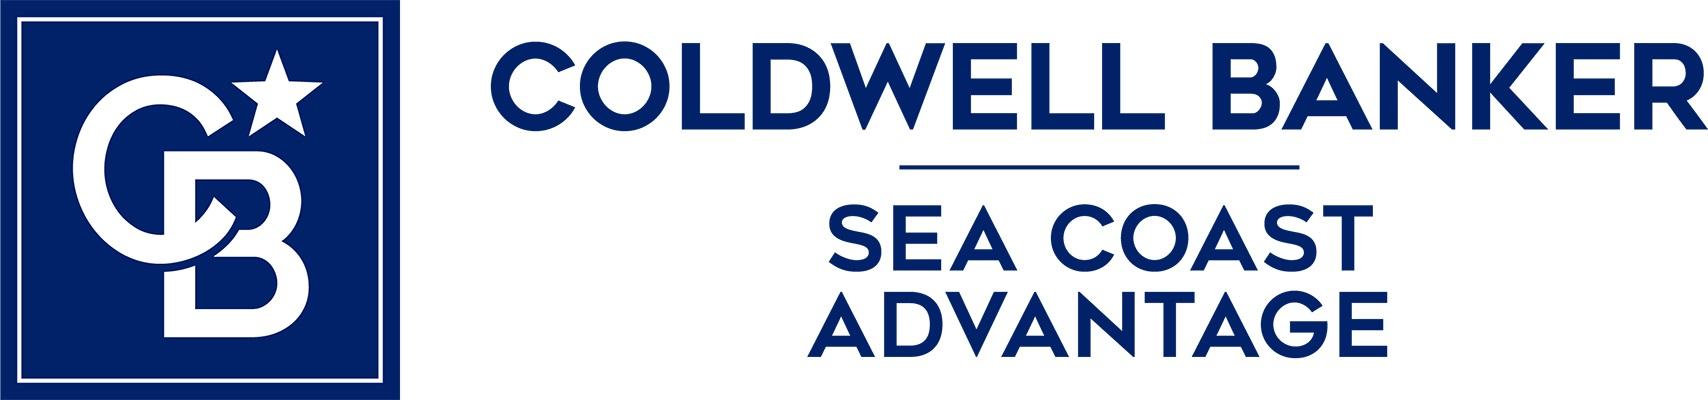 Judy McGuire - Coldwell Banker Sea Coast Advantage Realty Logo